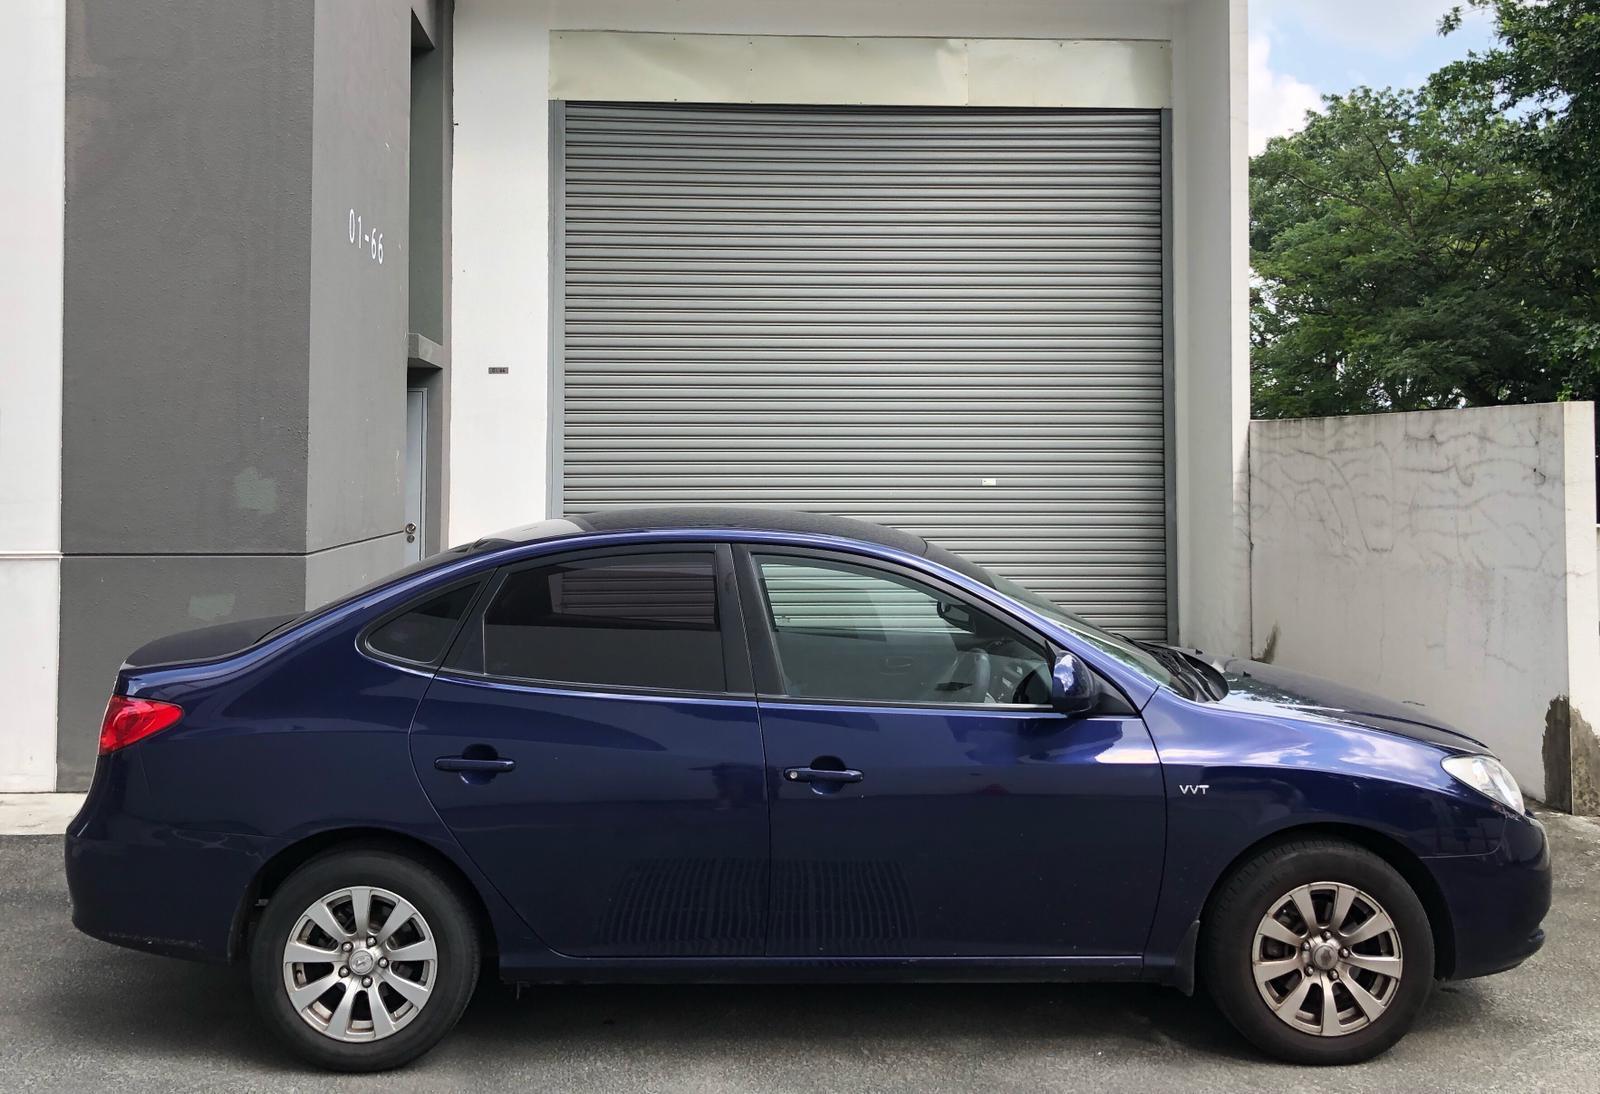 Hyundai Avante 1.6a Mazda Toyota Vios Wish Altis Car Axio Premio Allion Camry Estima Honda Jazz Fit Stream Civic Cars $50 perday PHV  For Rent Grab Rental Gojek Or Personal Use Low price and Cheap